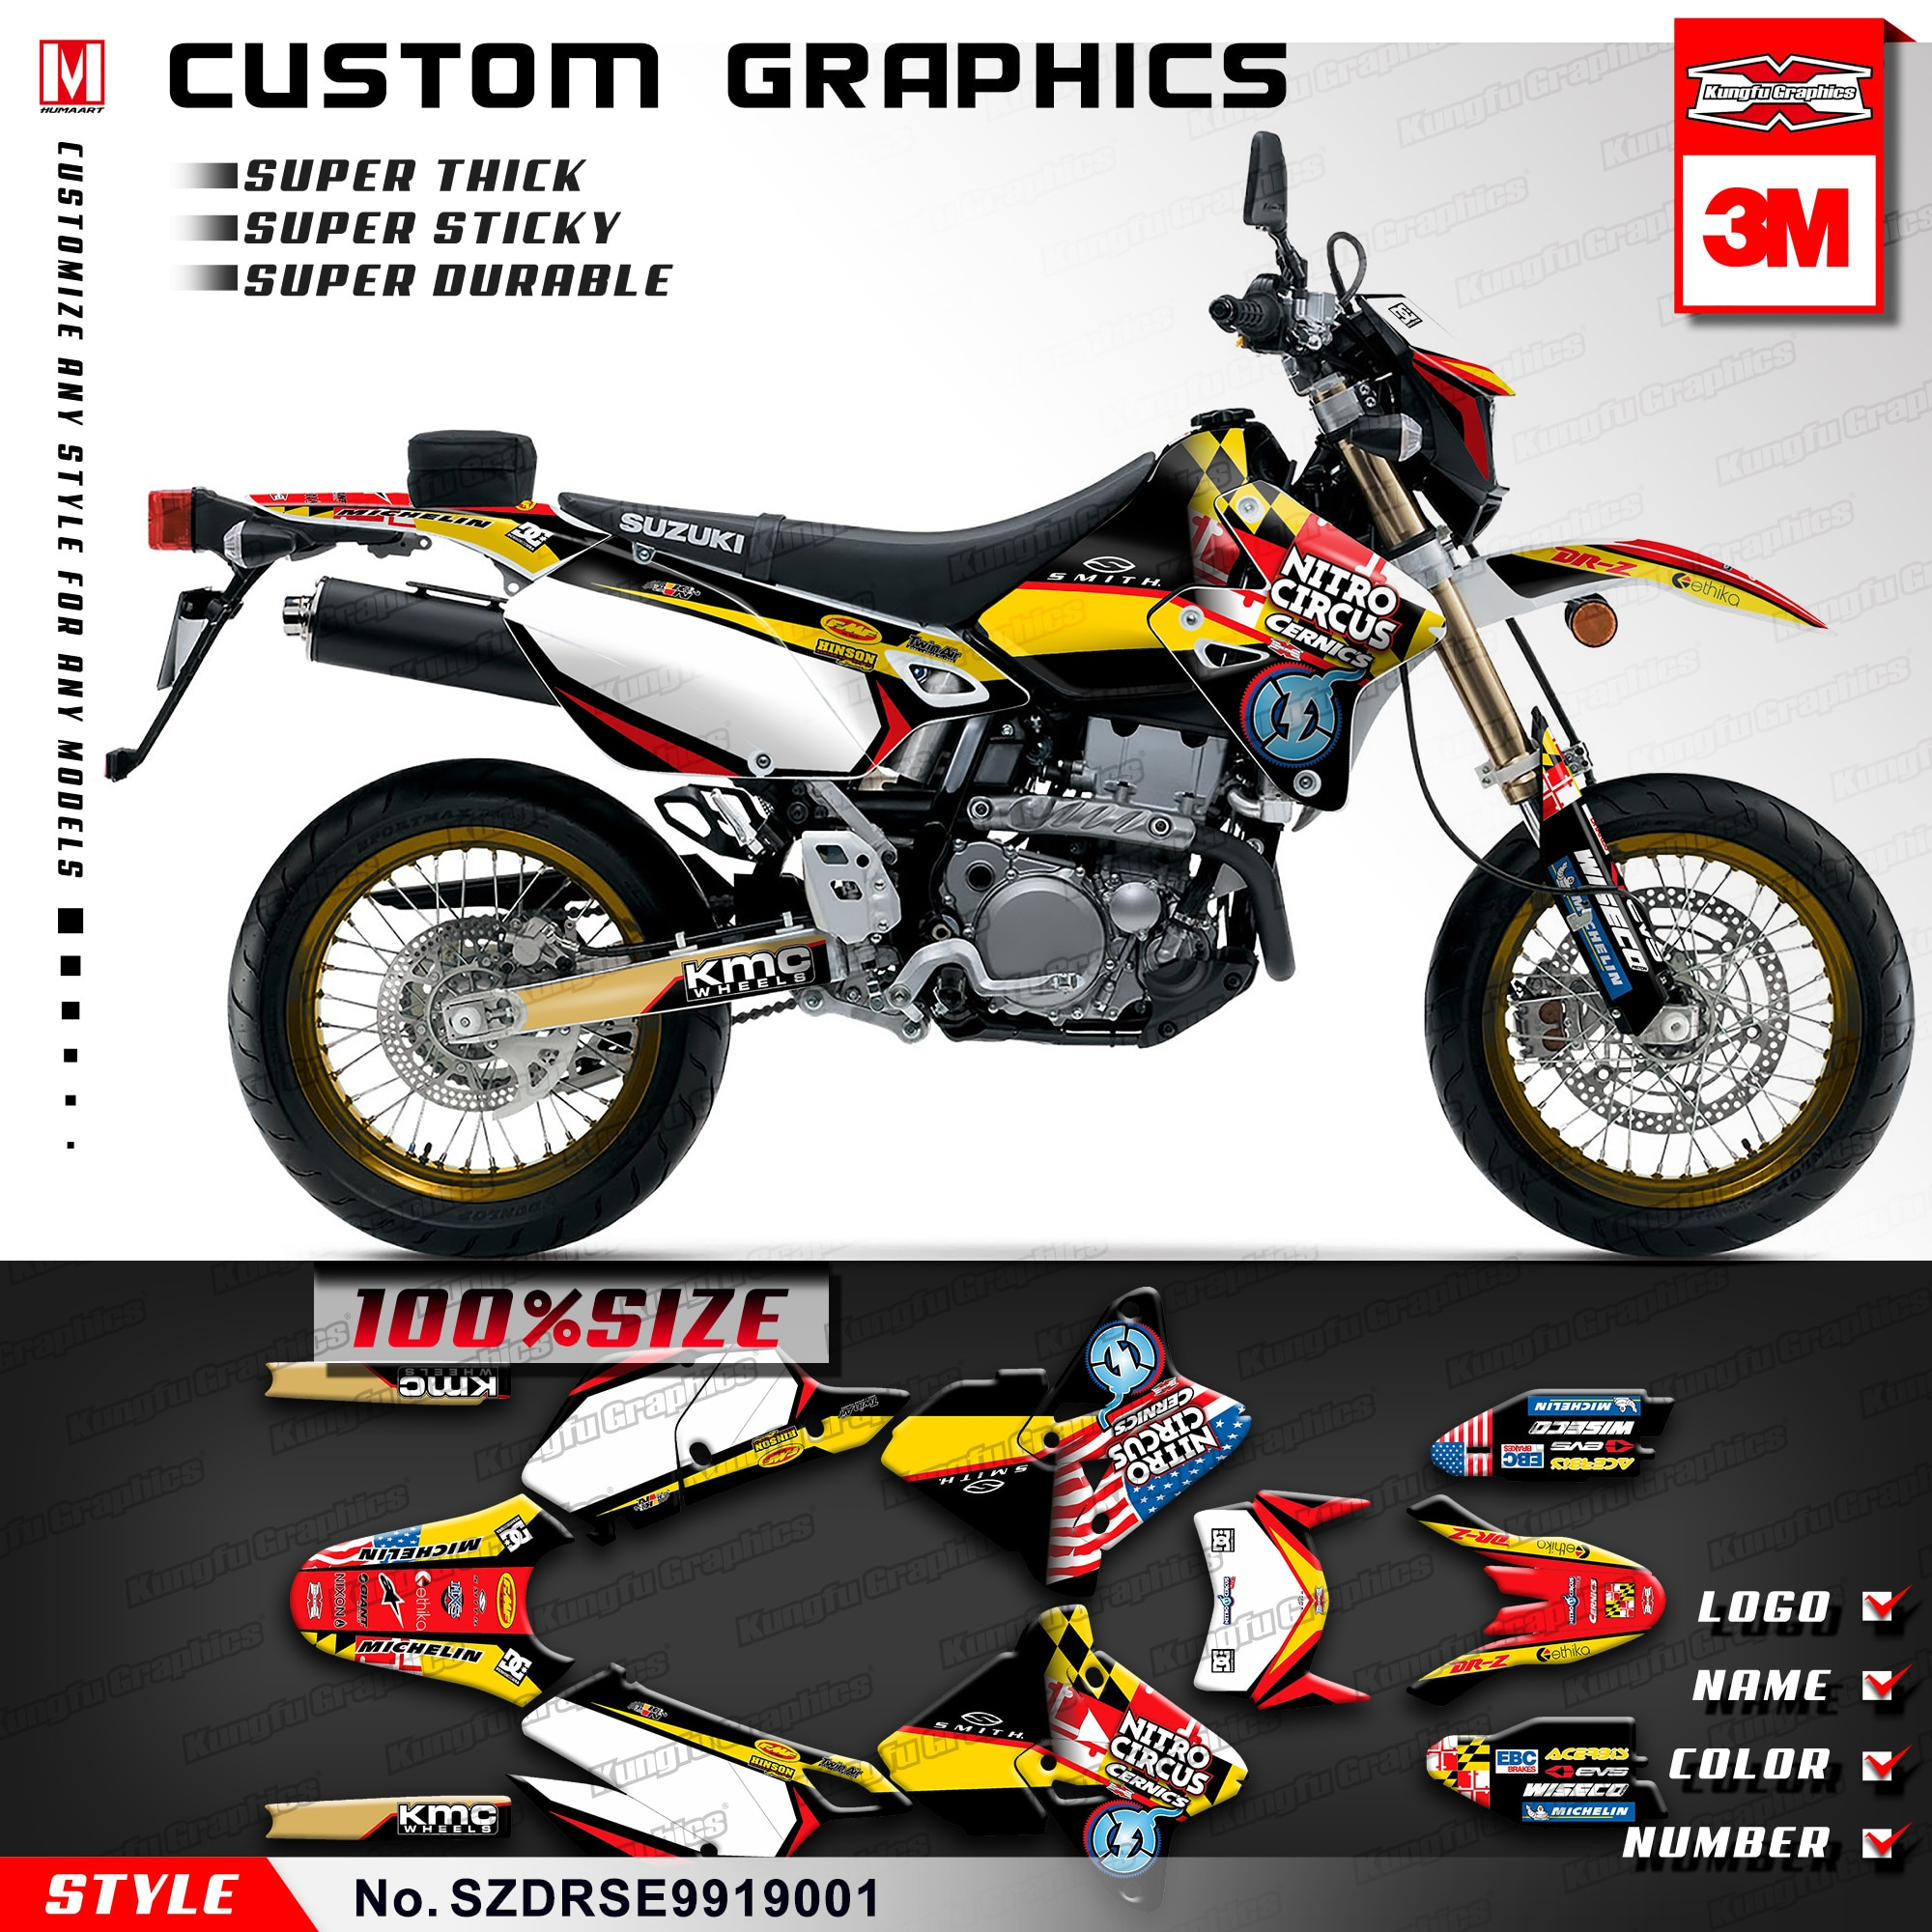 Kung Fu gráficos Motocross calcomanías de vinilo para Suzuki DRZ400SM Supermoto DRZ400E Enduro 1999-2019 (el estilo no SZDRSE9919001)